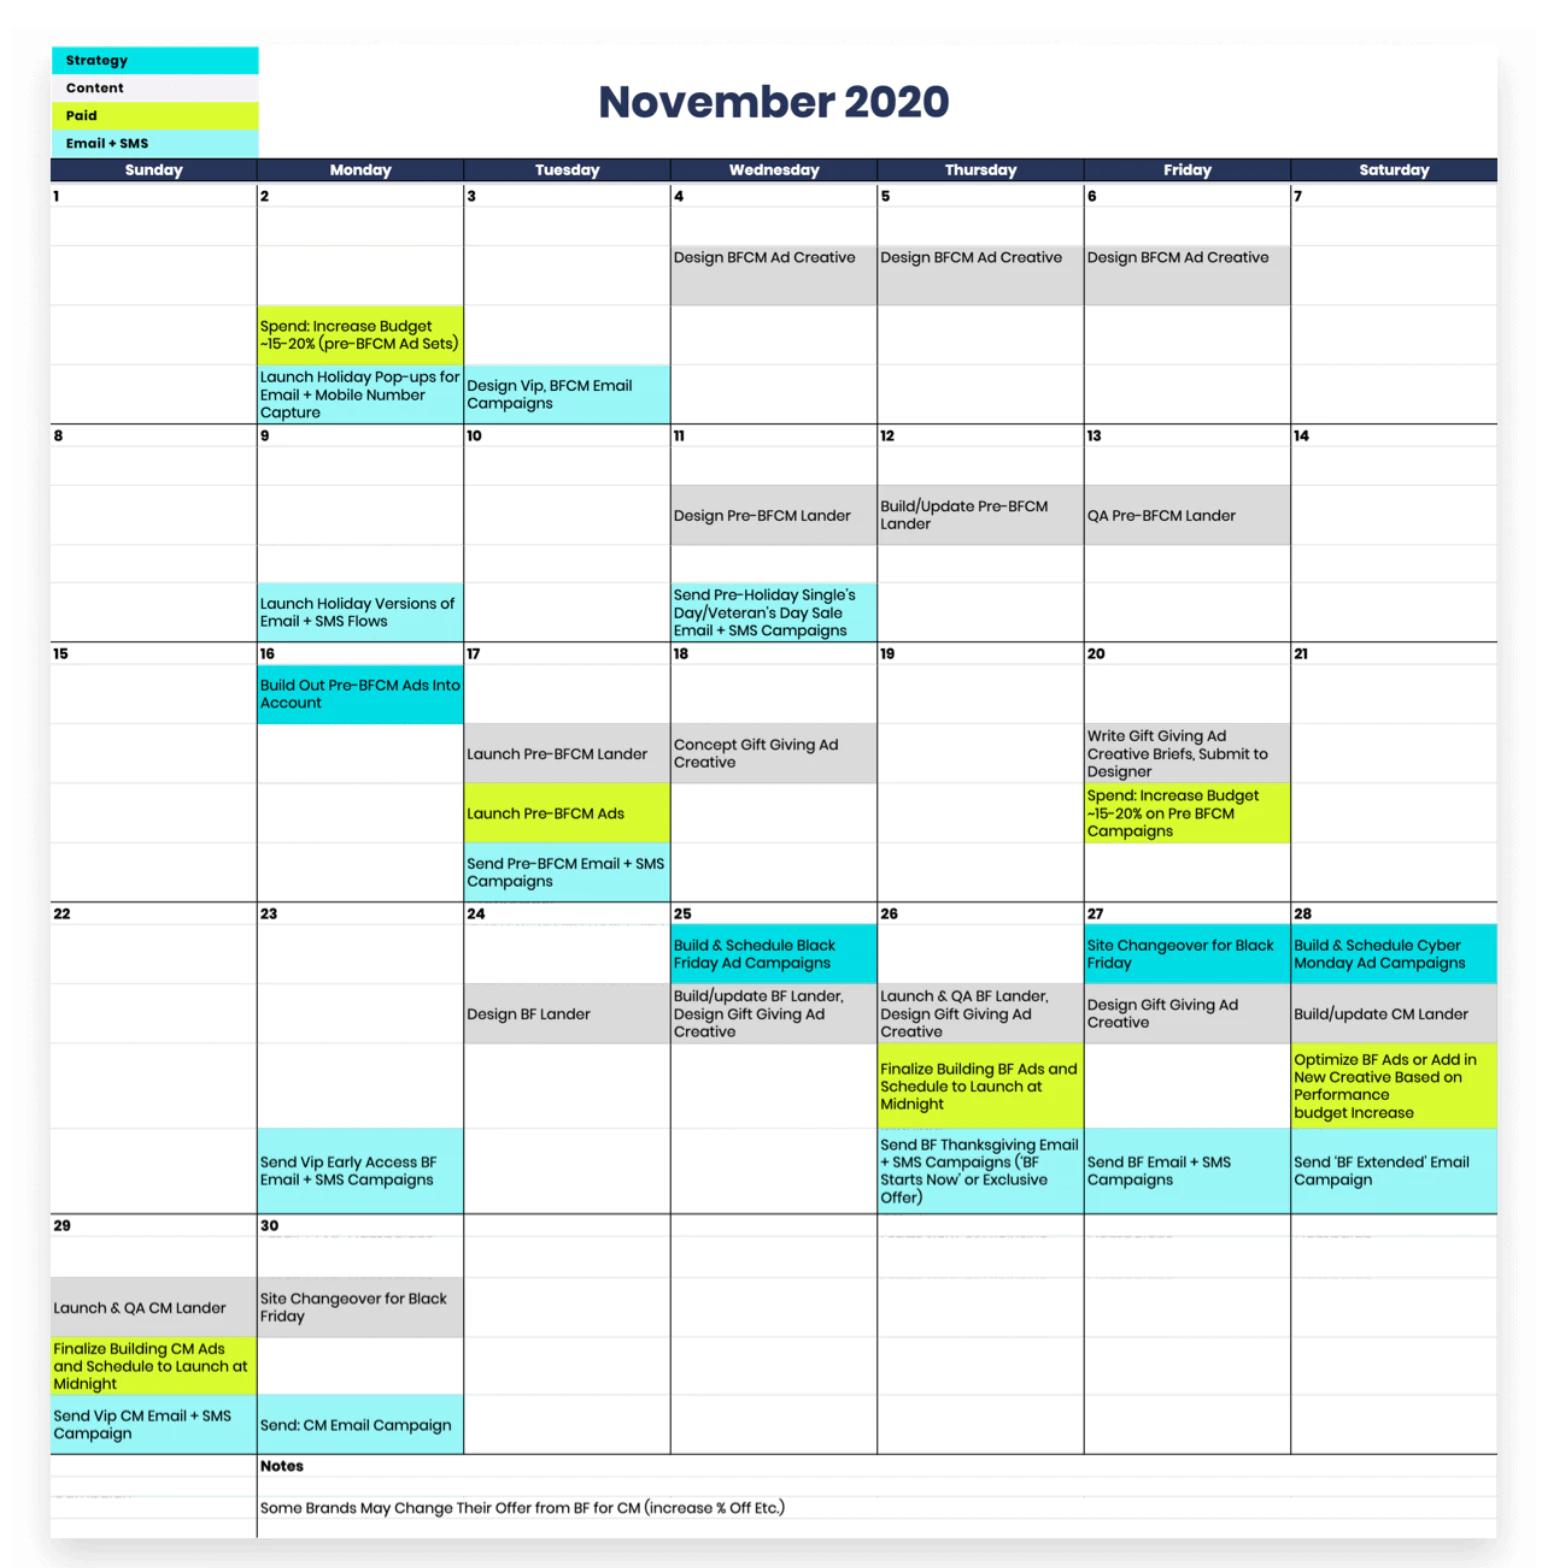 Guide to Setup Store for Black Friday Marketing- make a promotional content calendar